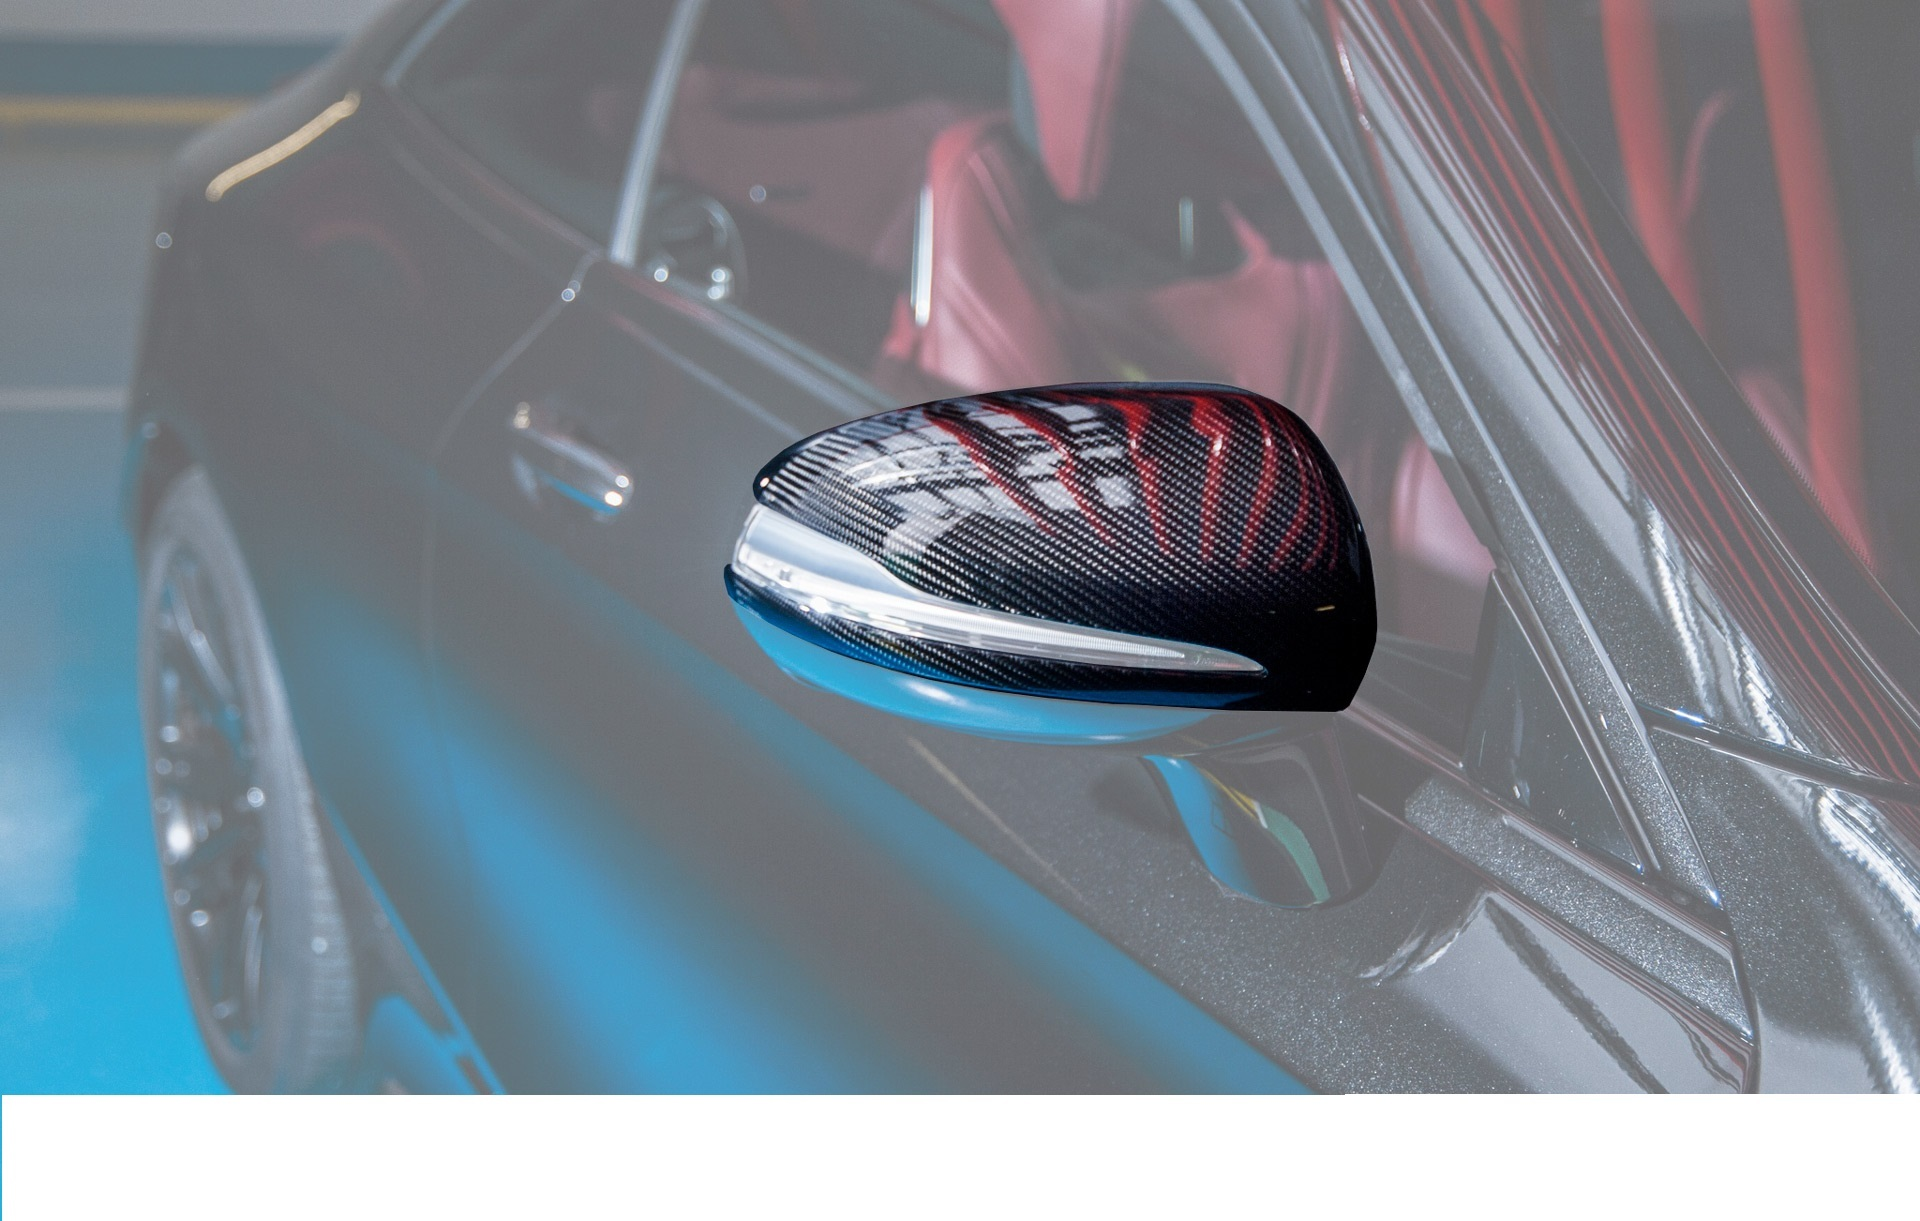 Карбоновые корпуса зеркал    для Mercedes S63 AMG W222